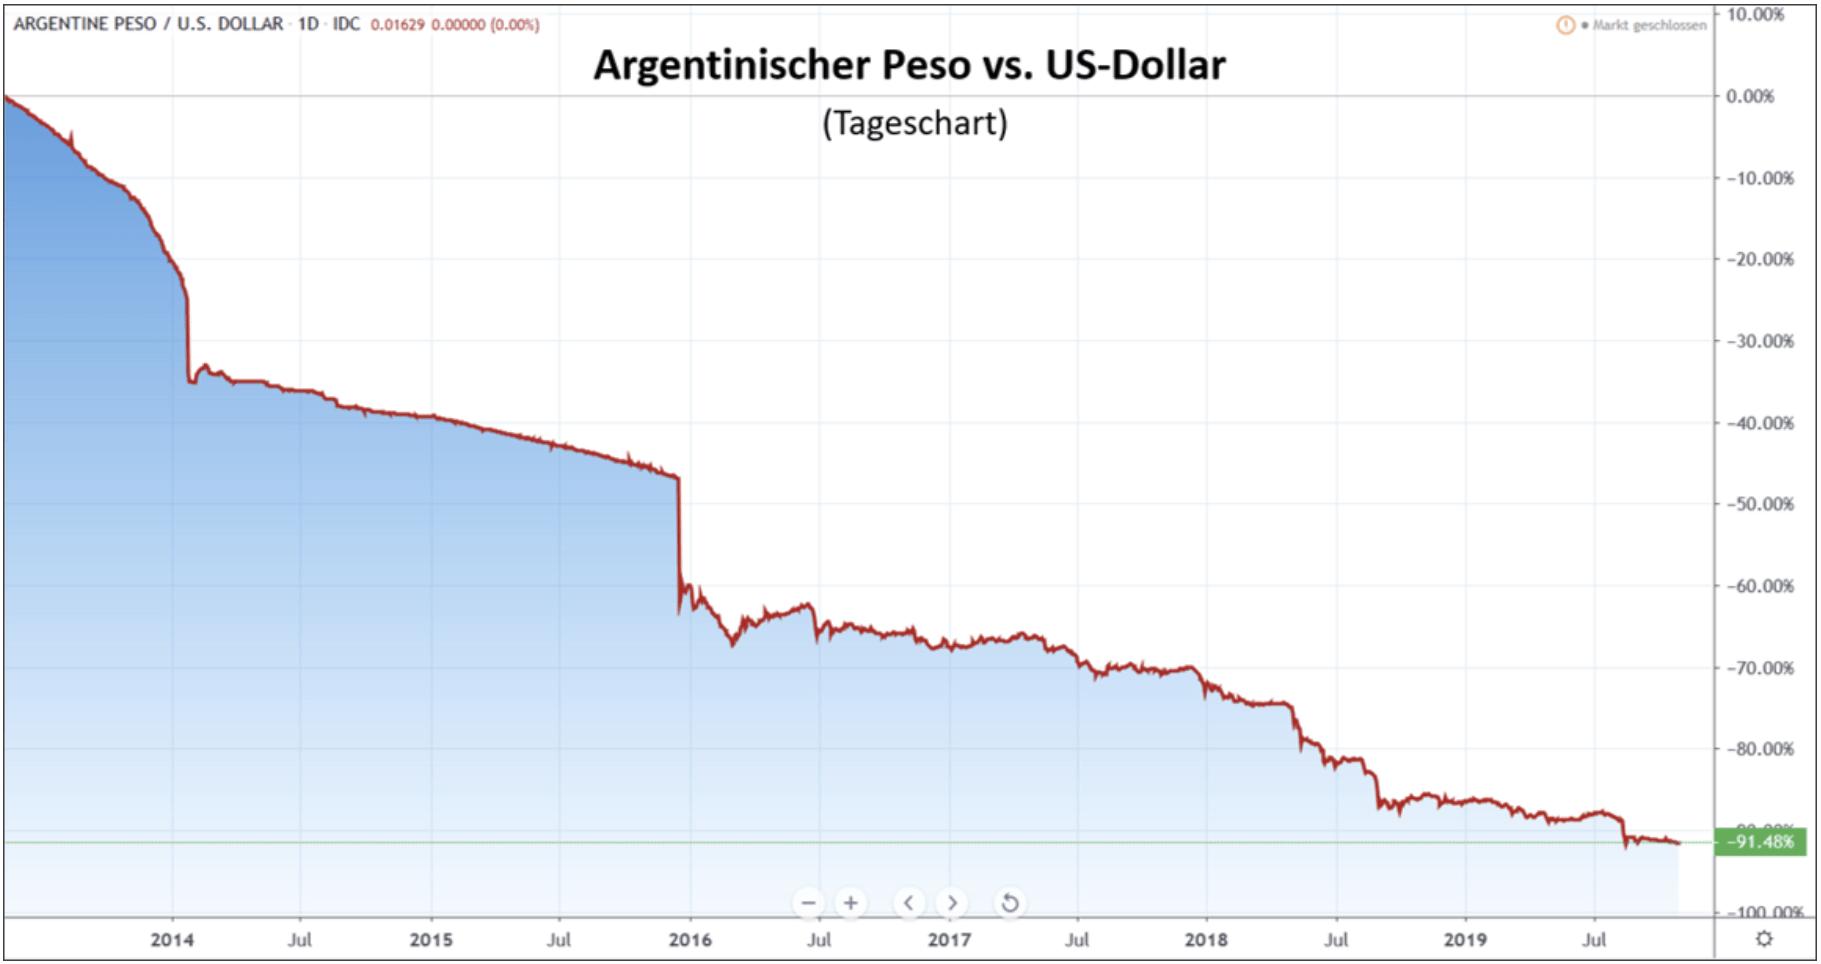 Argentinischer Peso vs USD